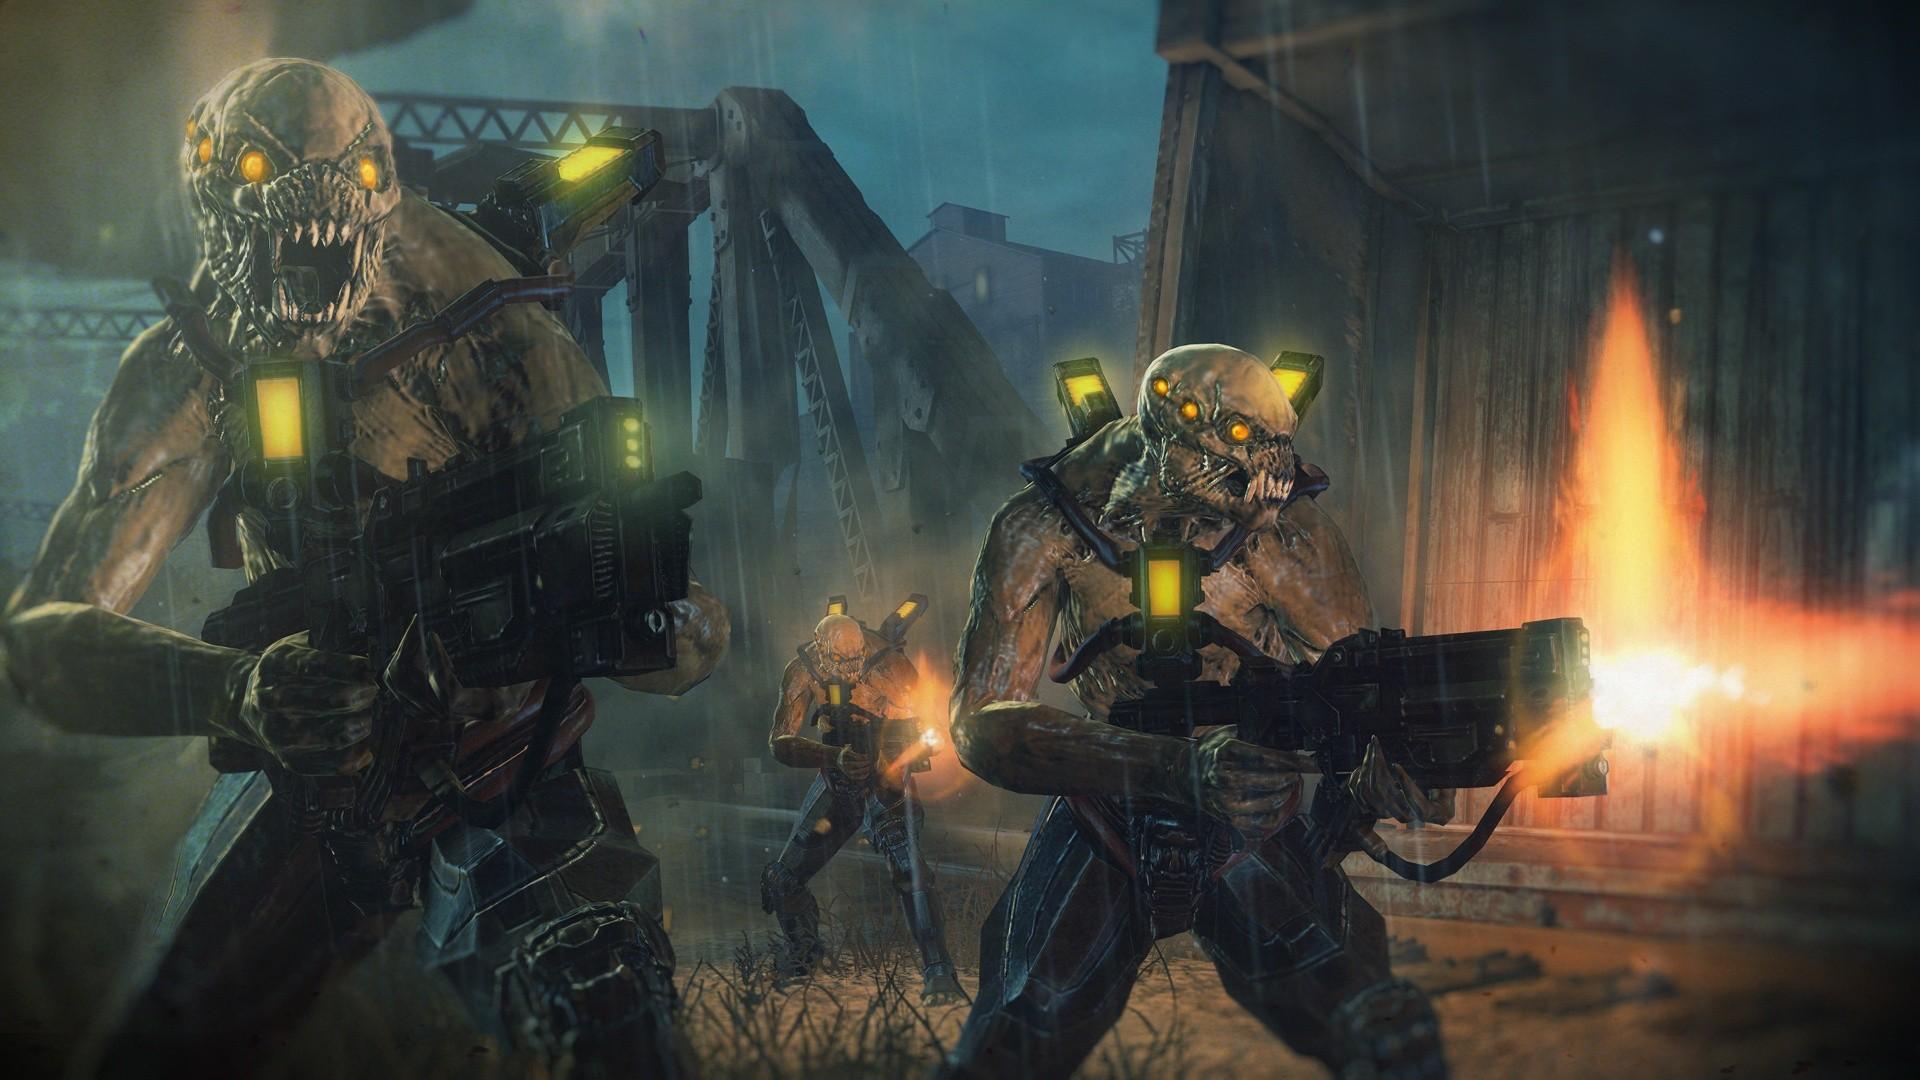 Resistance screenshot